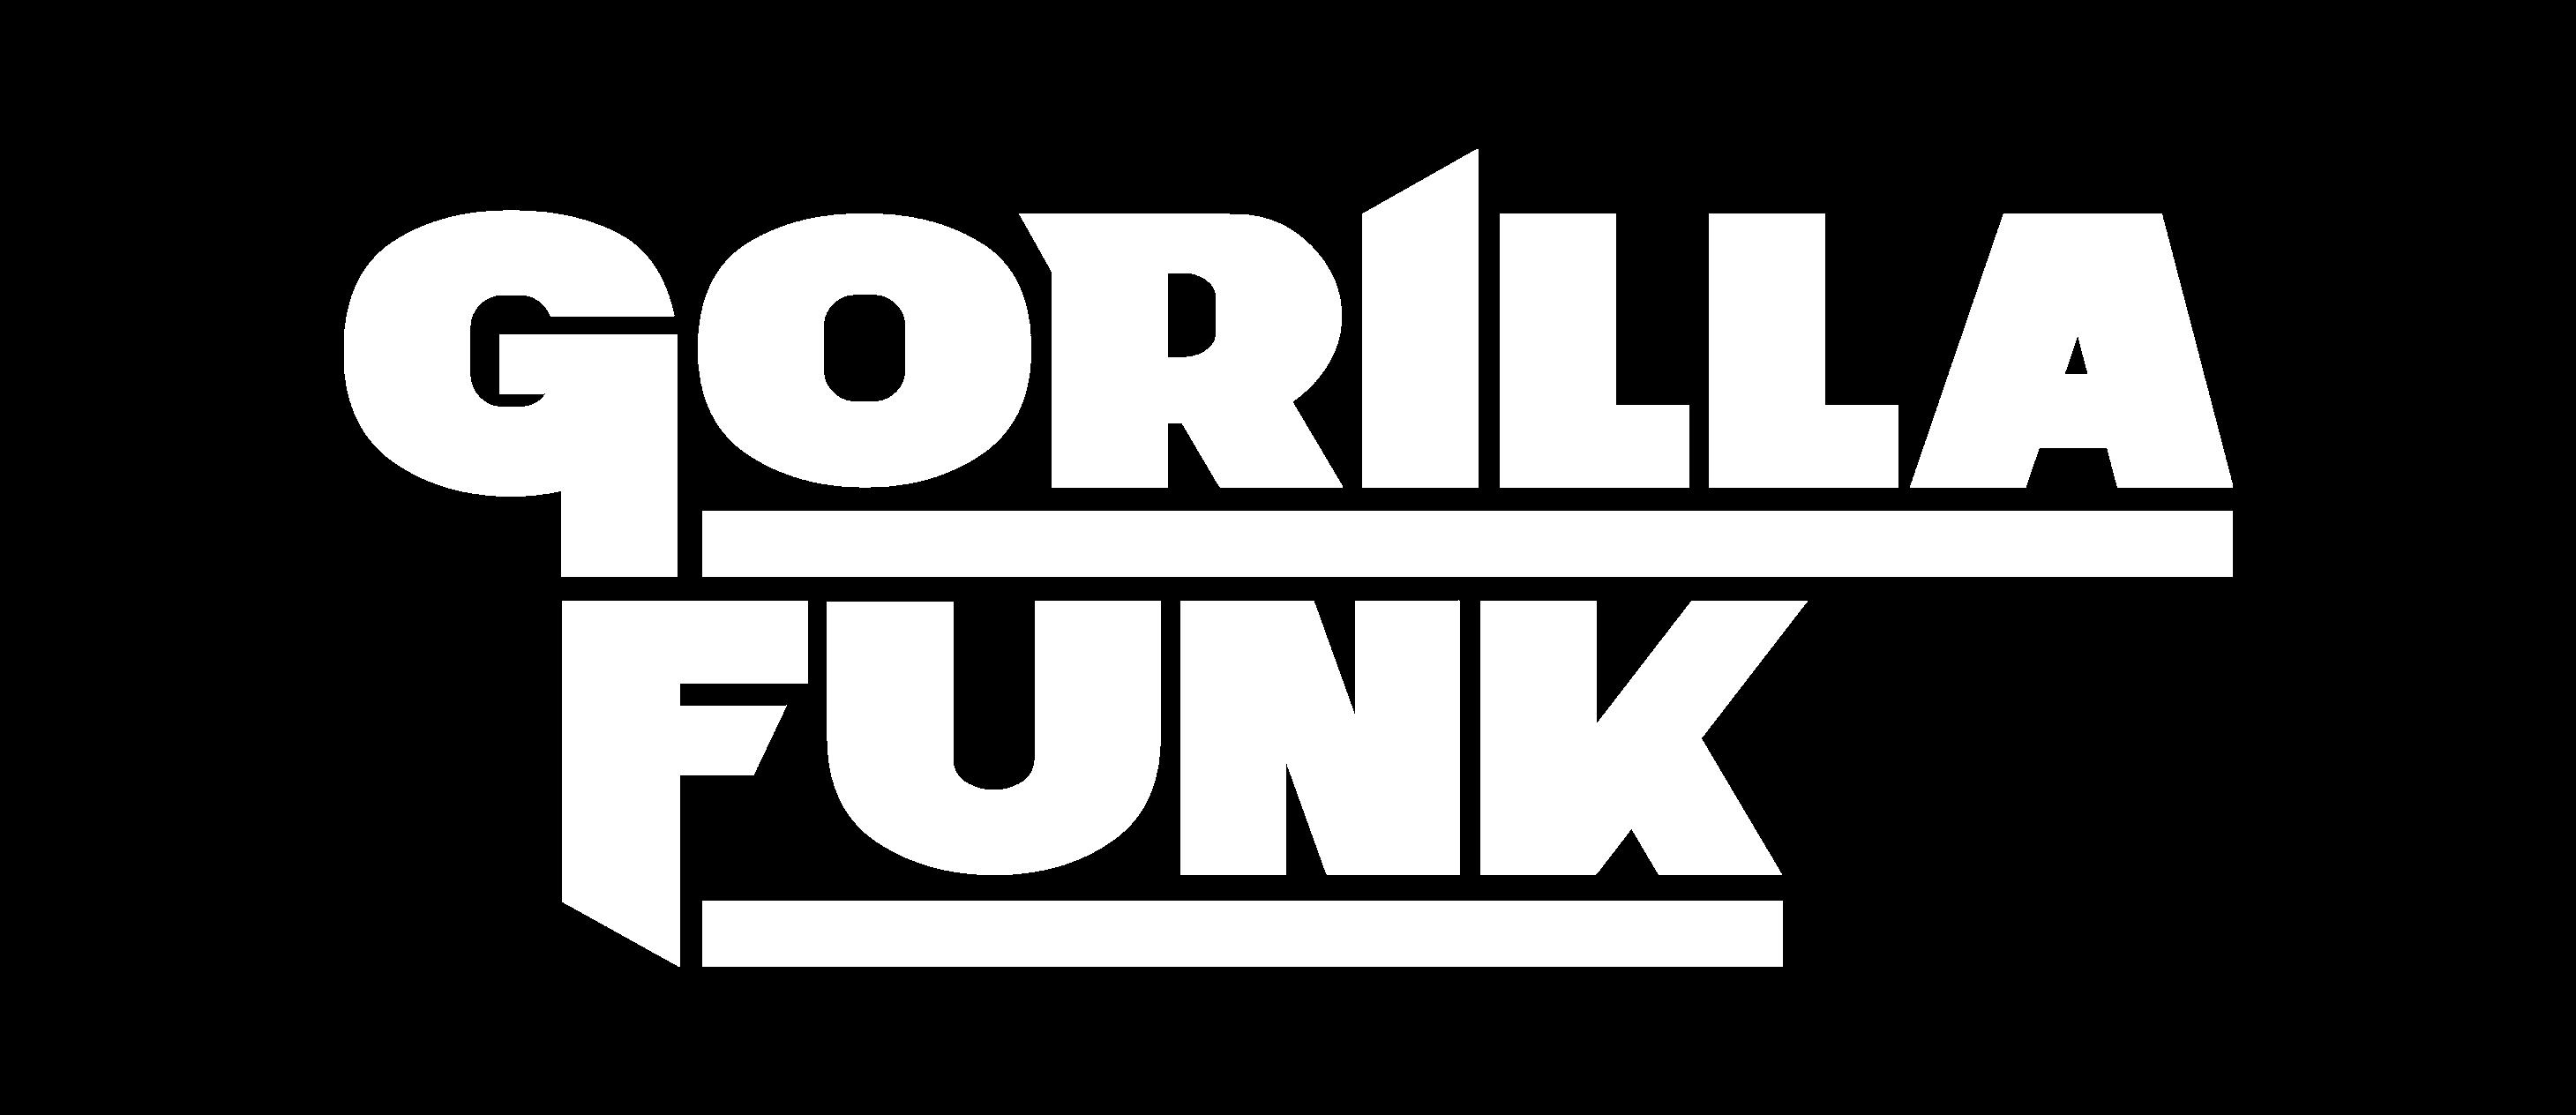 http://gorillafunk.de/wp-content/uploads/2018/01/GorillaFunk-Logo-big.png